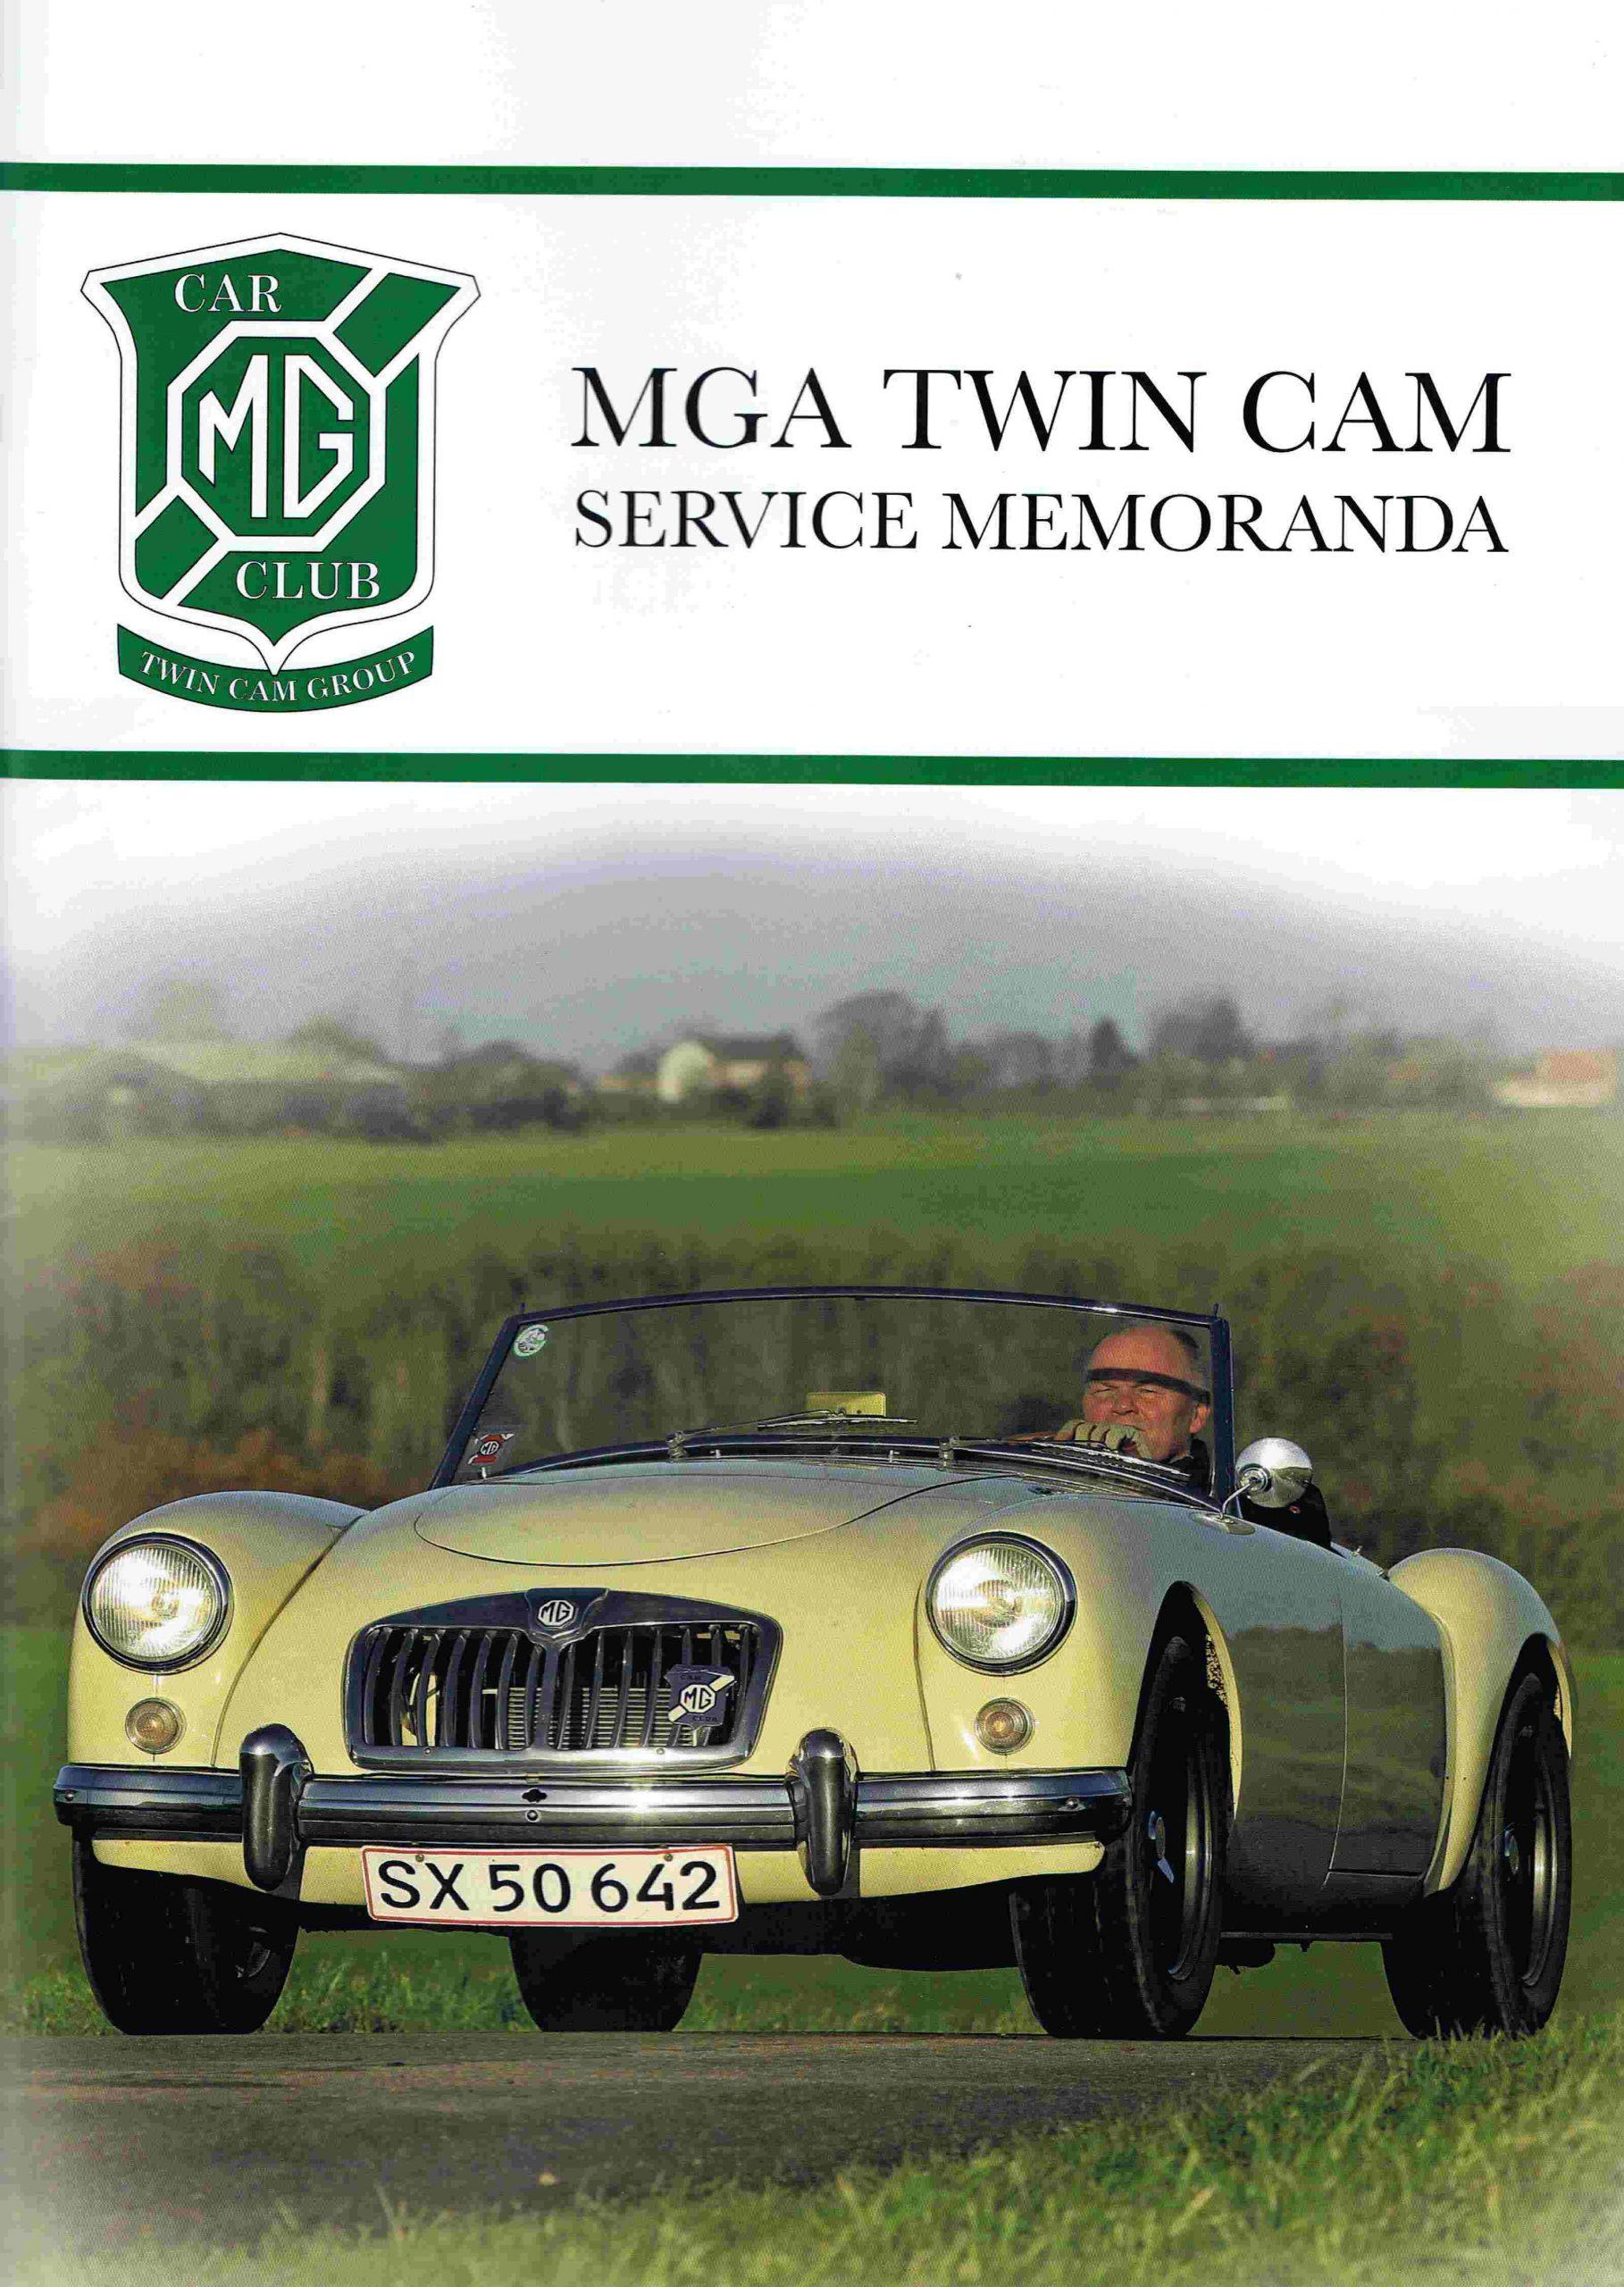 MGA Twin Cam Service Memoranda (Dansk)